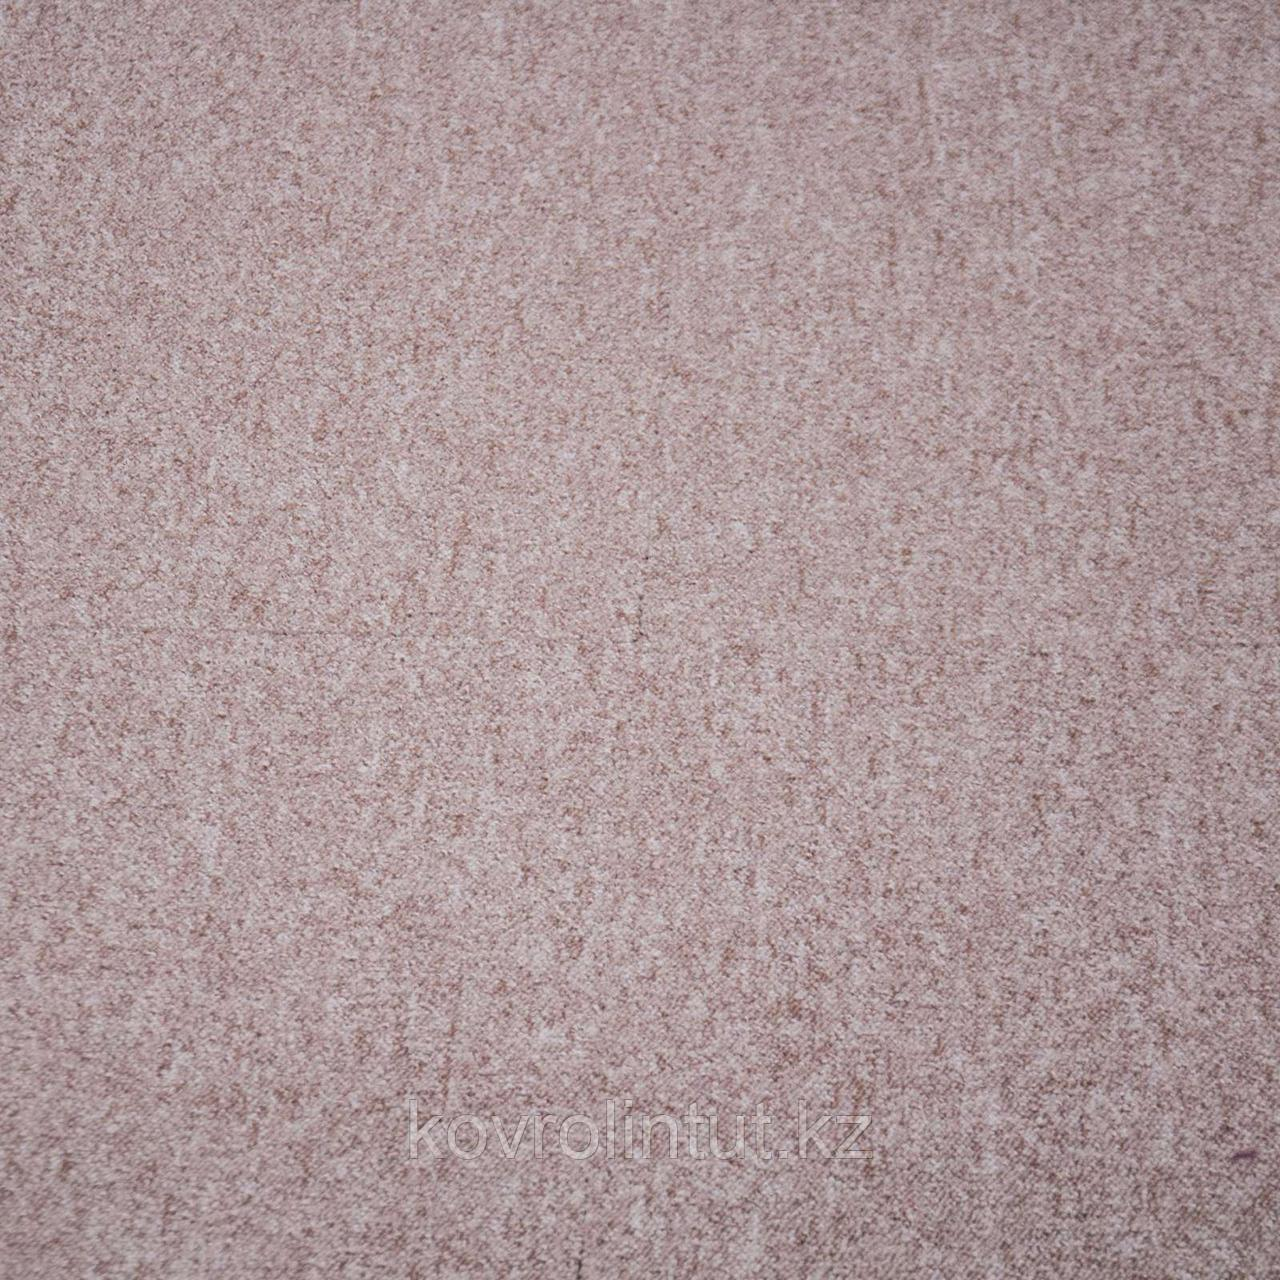 Плитка ковровая Сondor, Solid 70, 50х50, 5м2/уп